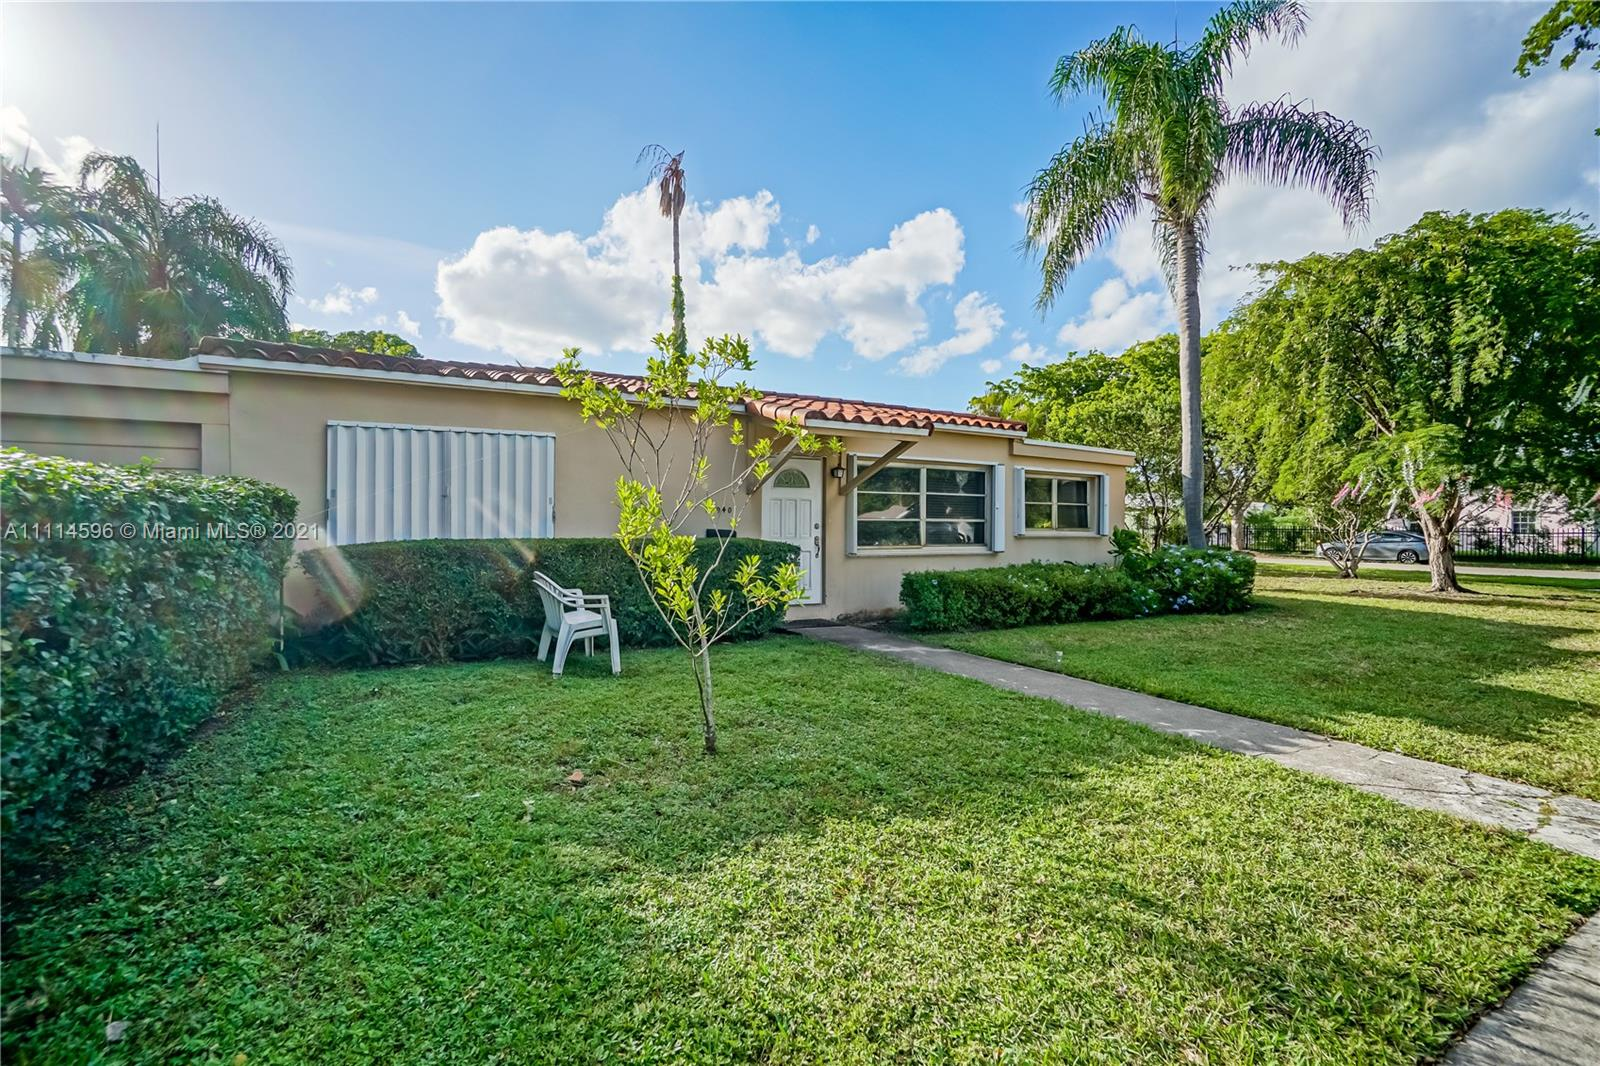 Single Family Home,For Sale,13940 NE 10th Ave, North Miami, Florida 33161,Brickell,realty,broker,condos near me